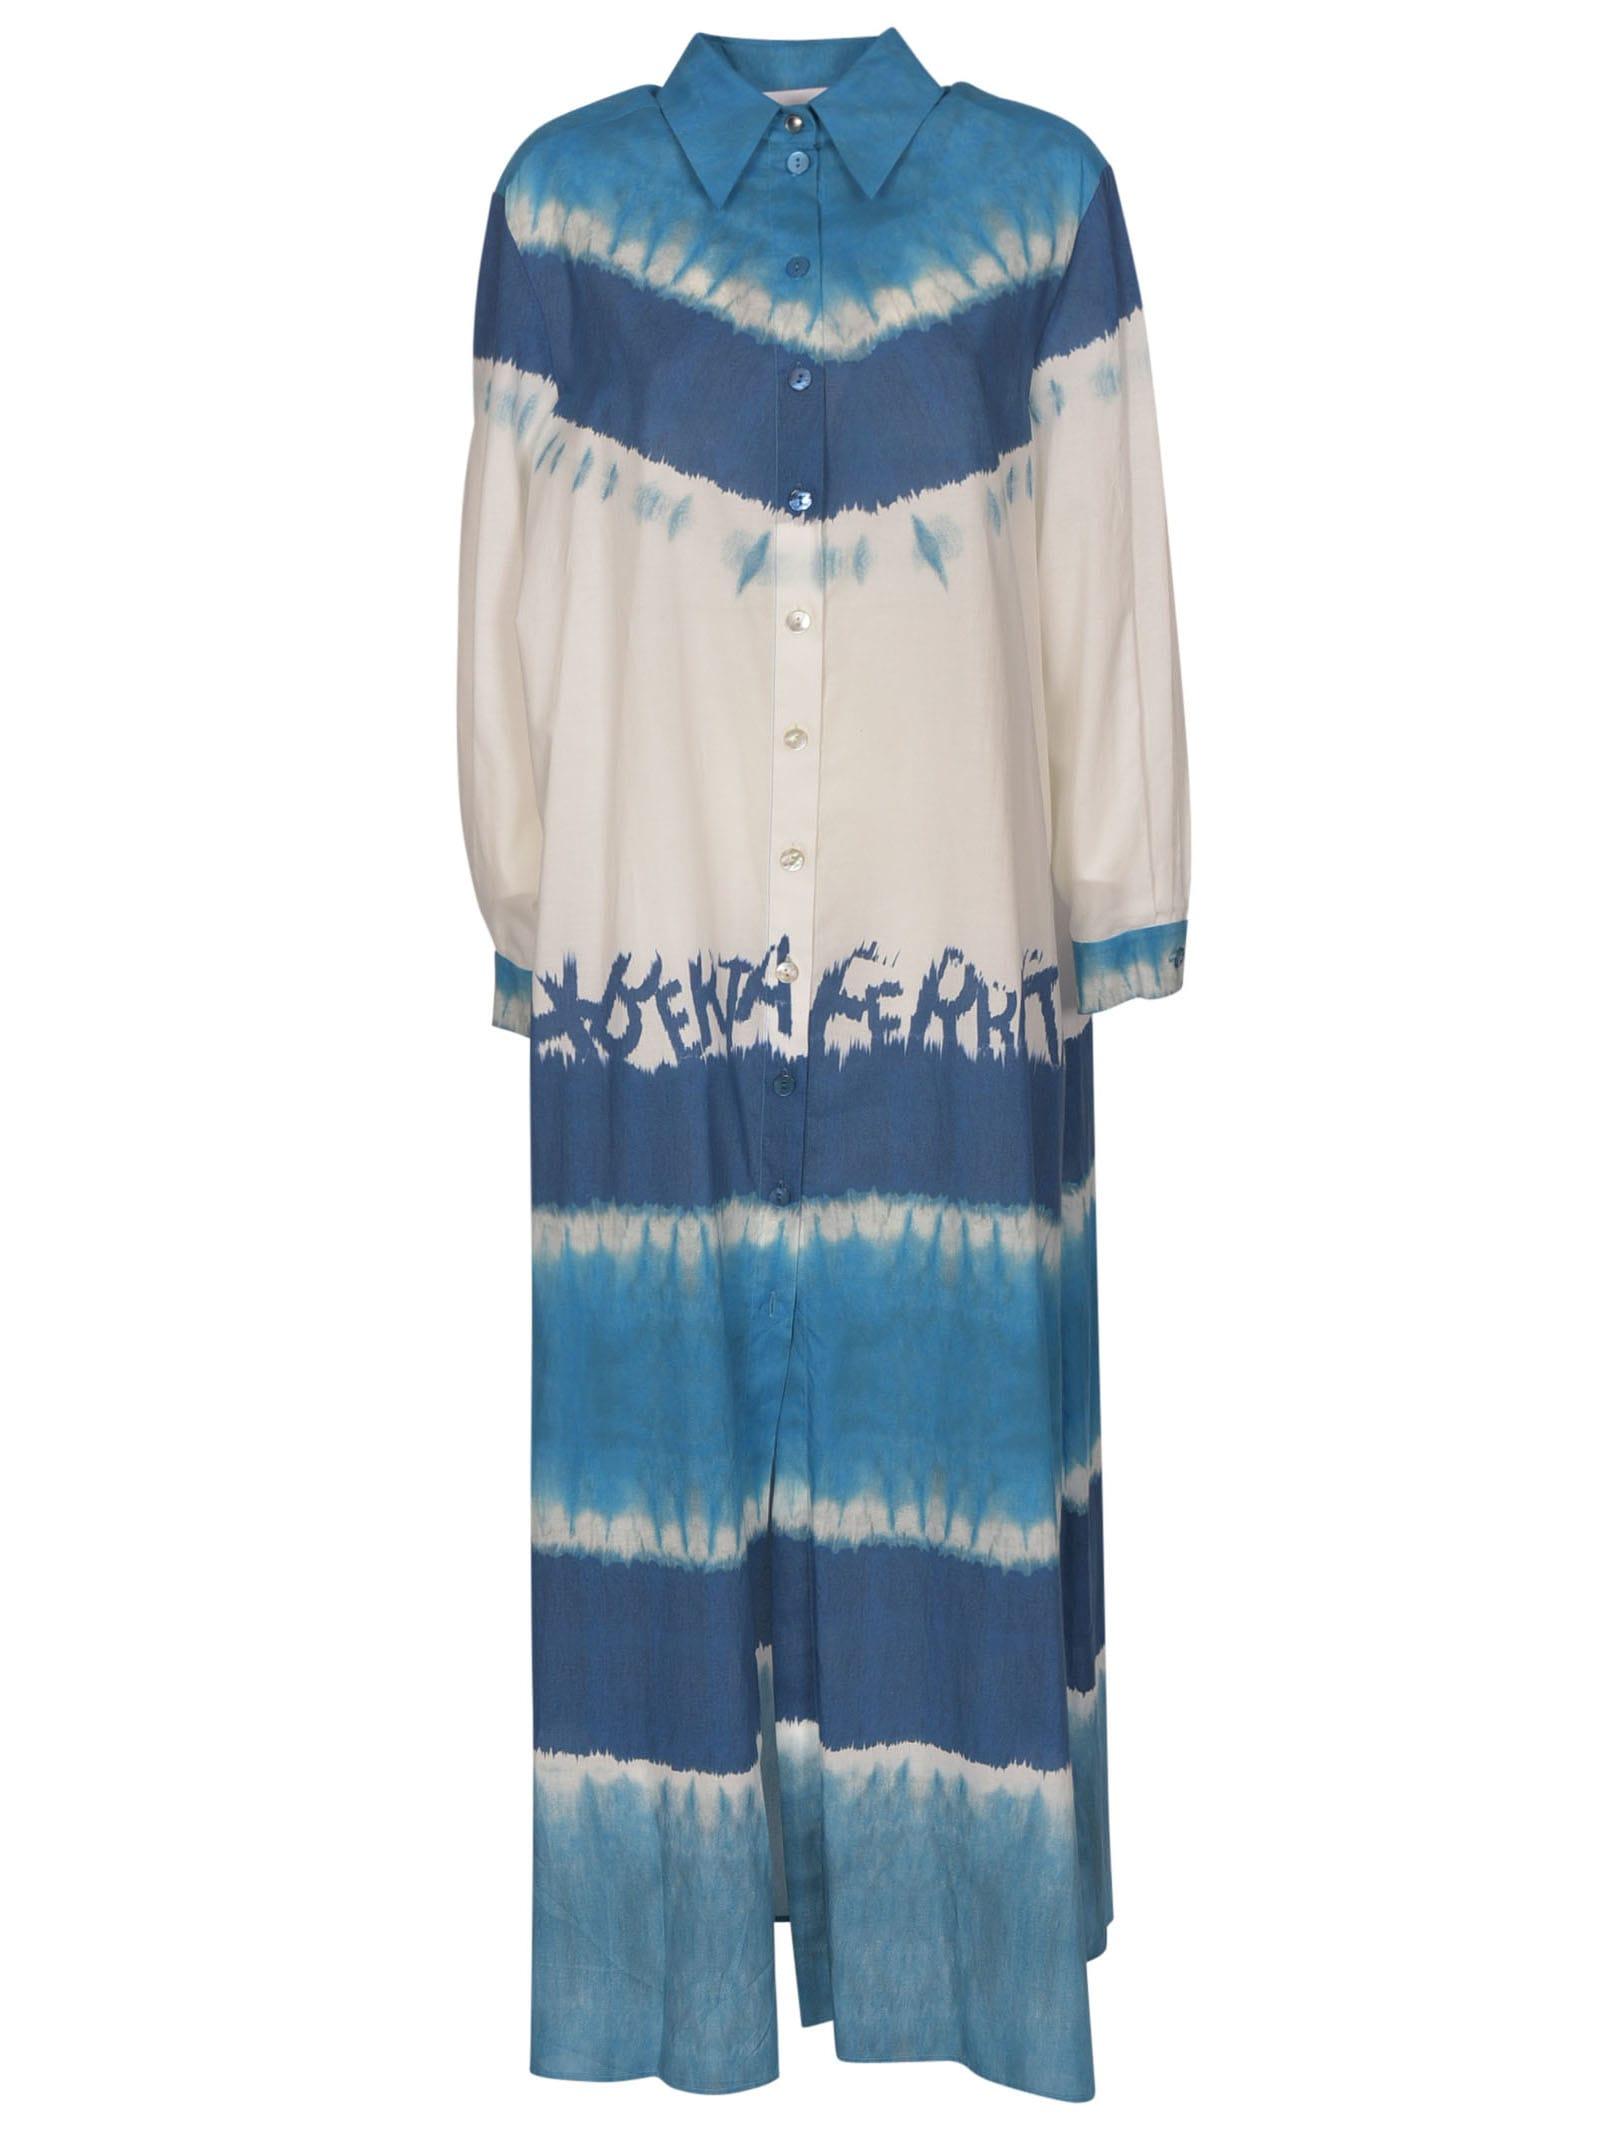 Alberta Ferretti Logo Dye Shirt Dress